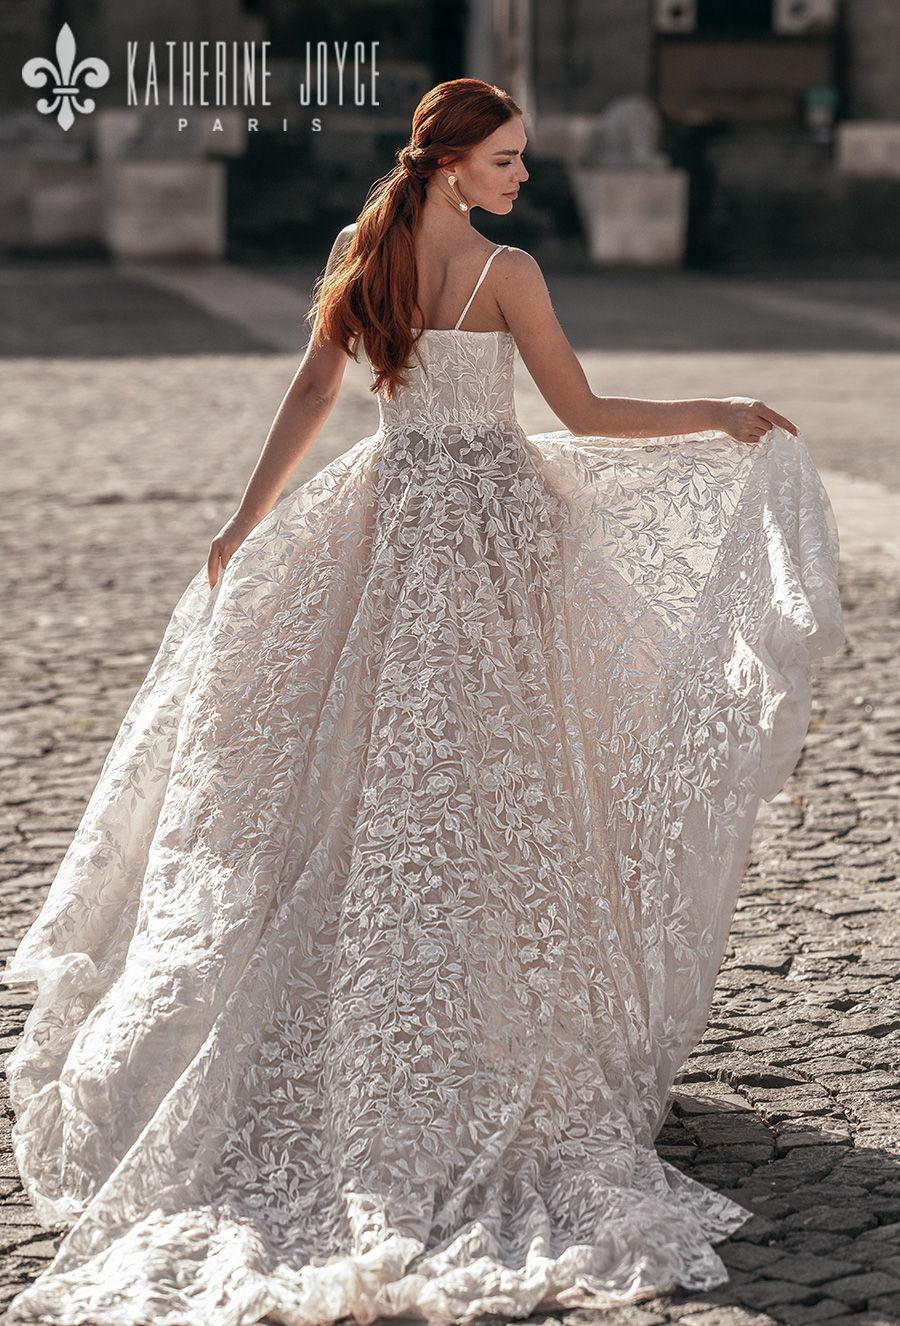 katherine joyce 2021 naples bridal sleeveless spaghetti strap square neckline full embellishment romantic soft a line wedding dress mid back chapel train (irena) bv